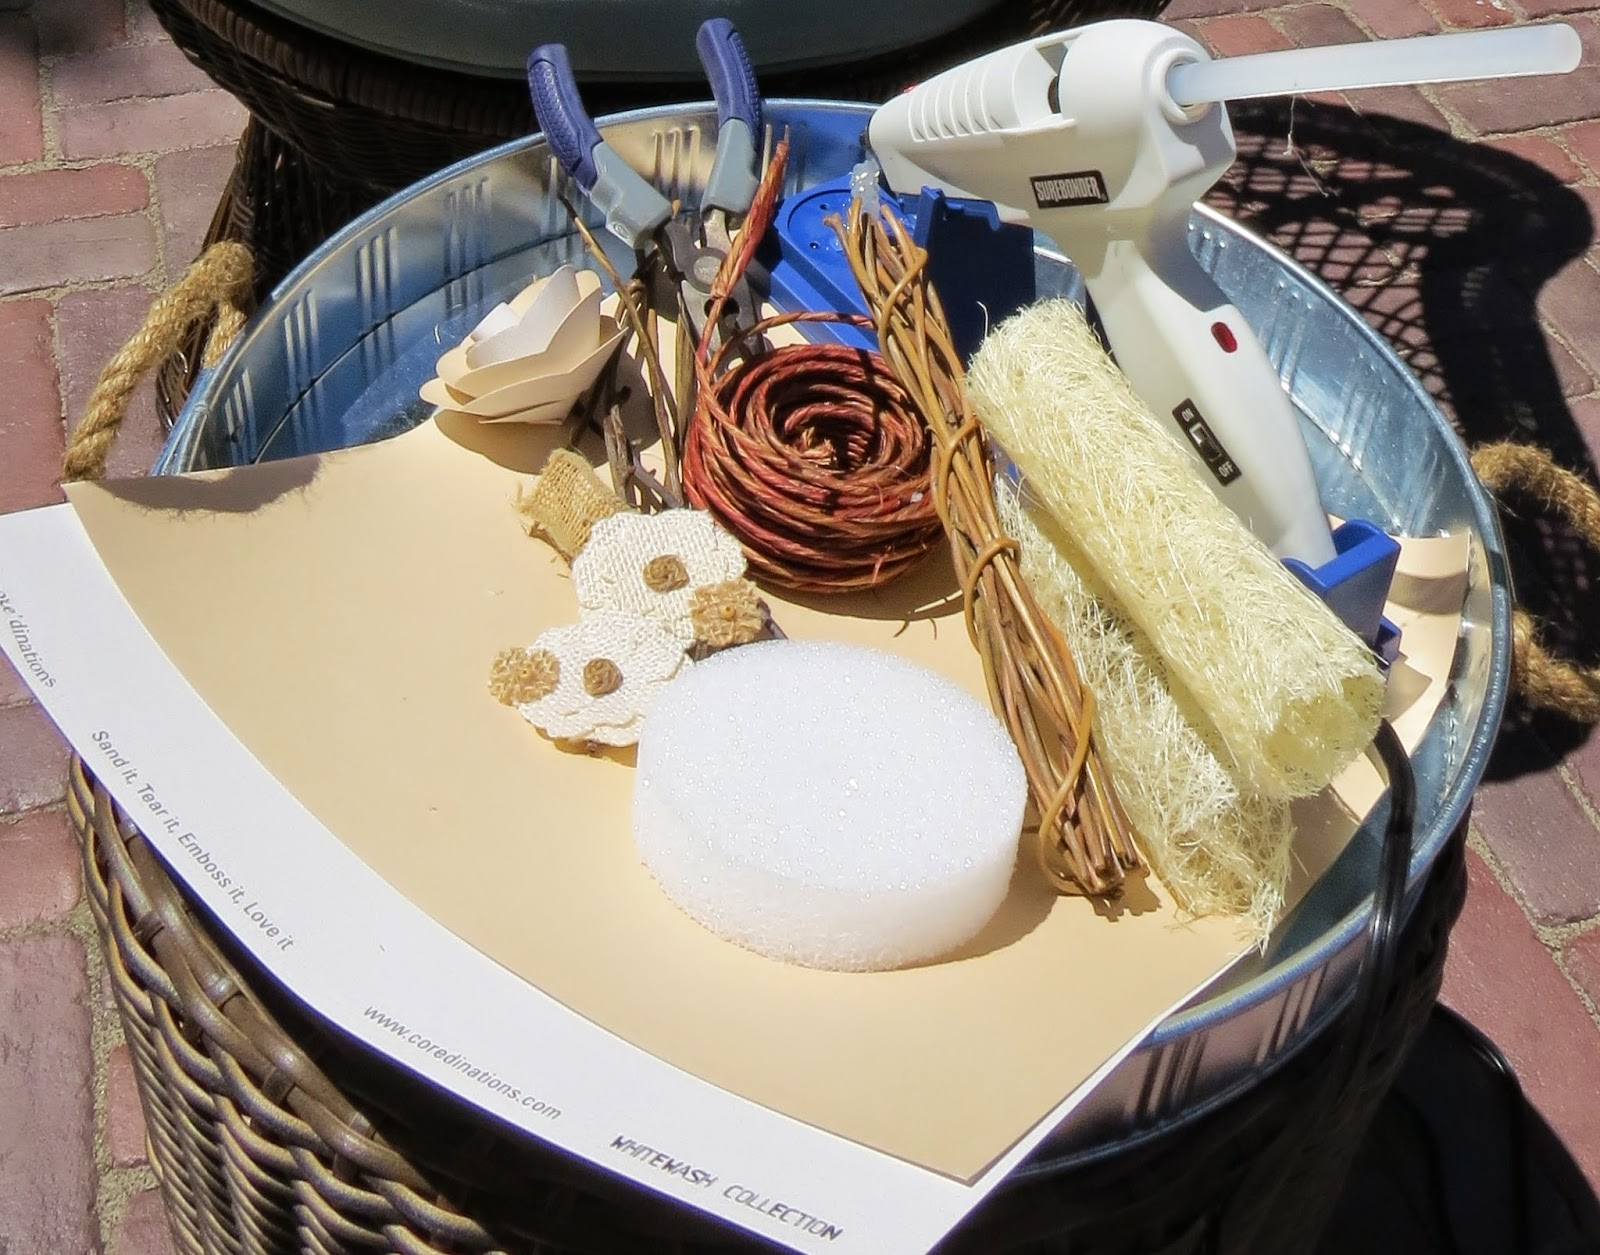 Supplies, Scrapbook paper, Cordless Glue Gun, Wire Cutters, Sisal,  Twigs, Styrofoam, Floral Wire, Burlap